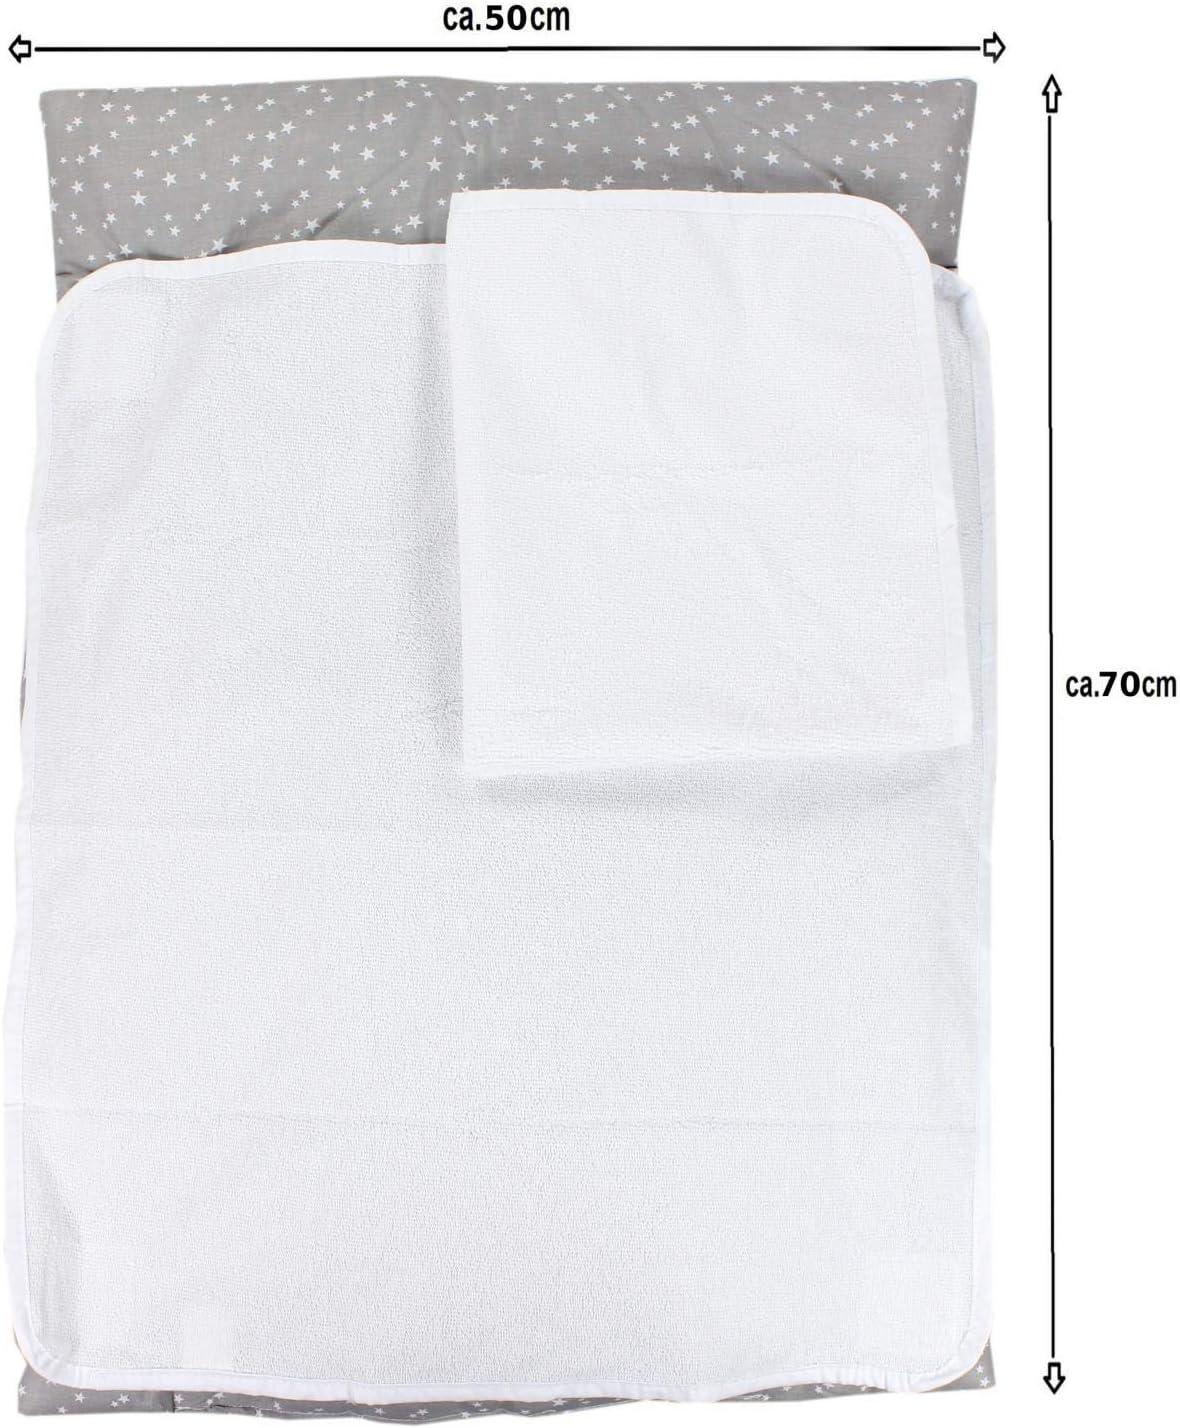 70 x 50 cm Beb/é TupTam Colch/ón para Cambiador con 2 Fundas Der Rizo Estrellas Blanco